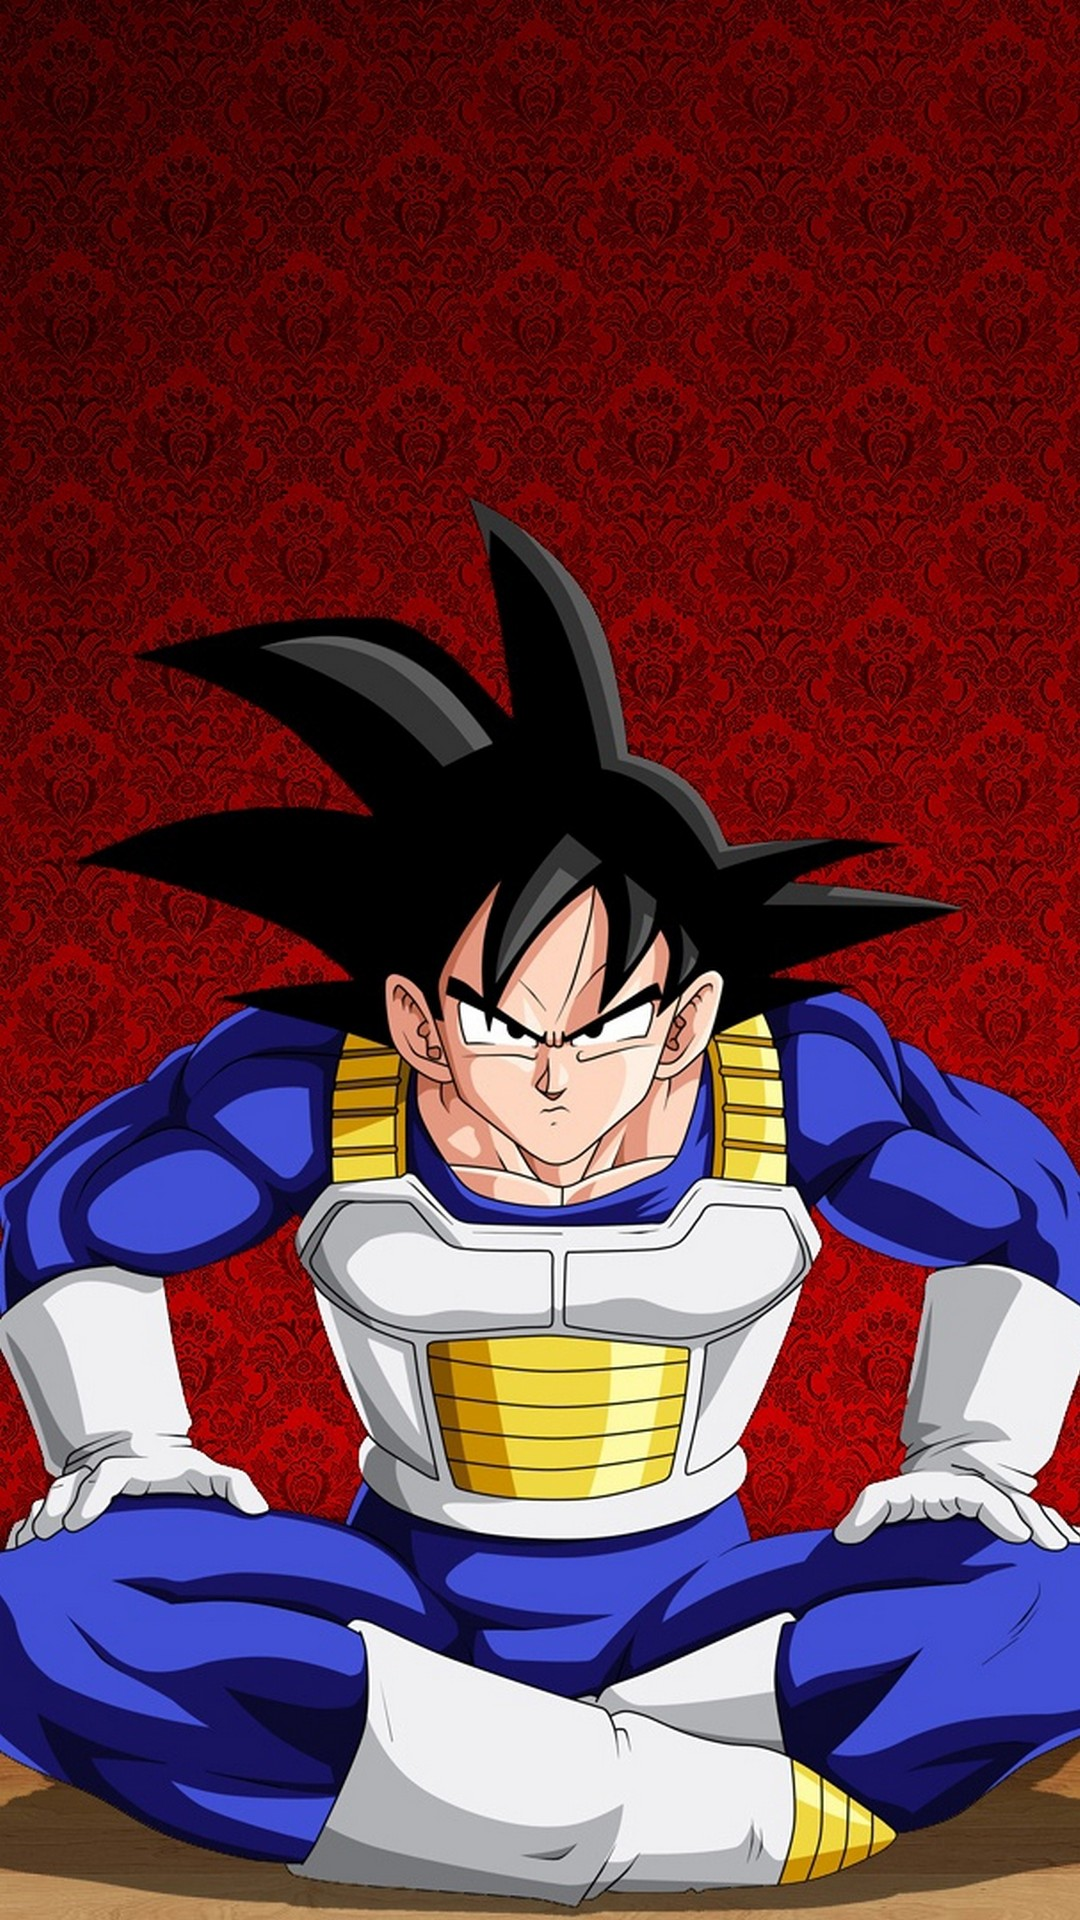 Dragon Ball Z Son Goku Hd 1071910 Hd Wallpaper Backgrounds Download